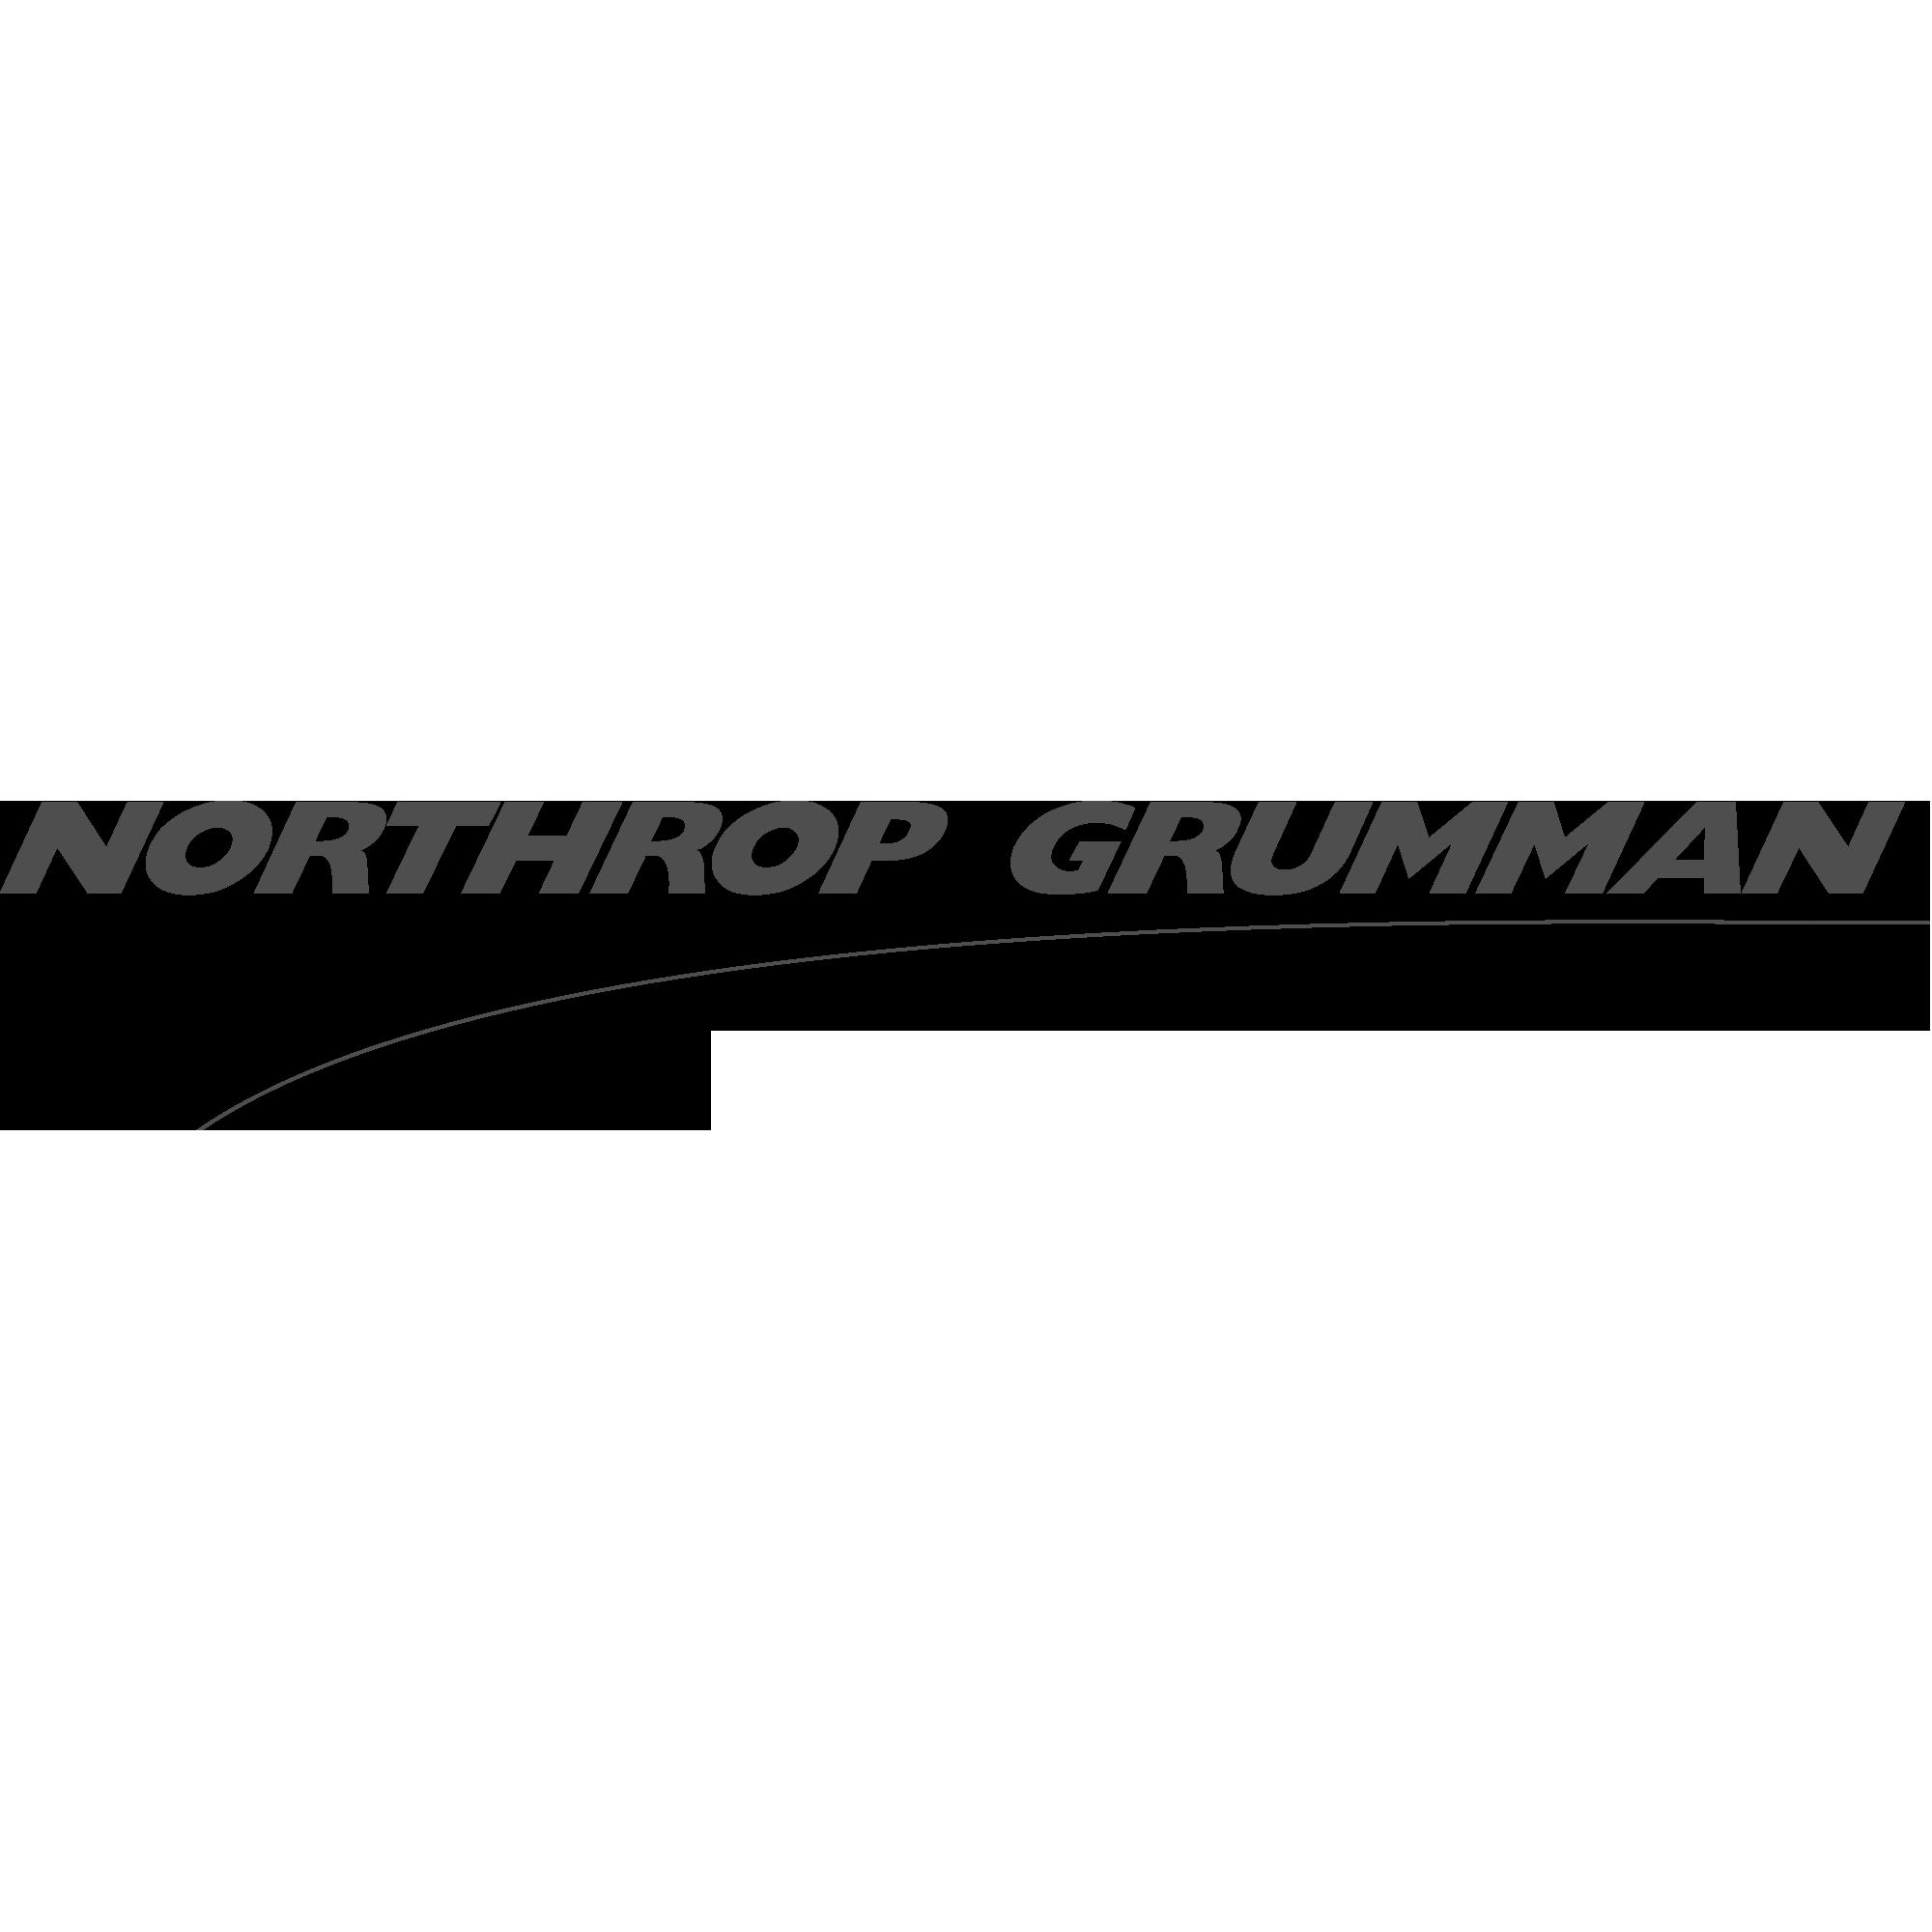 Northrop Grumman copy